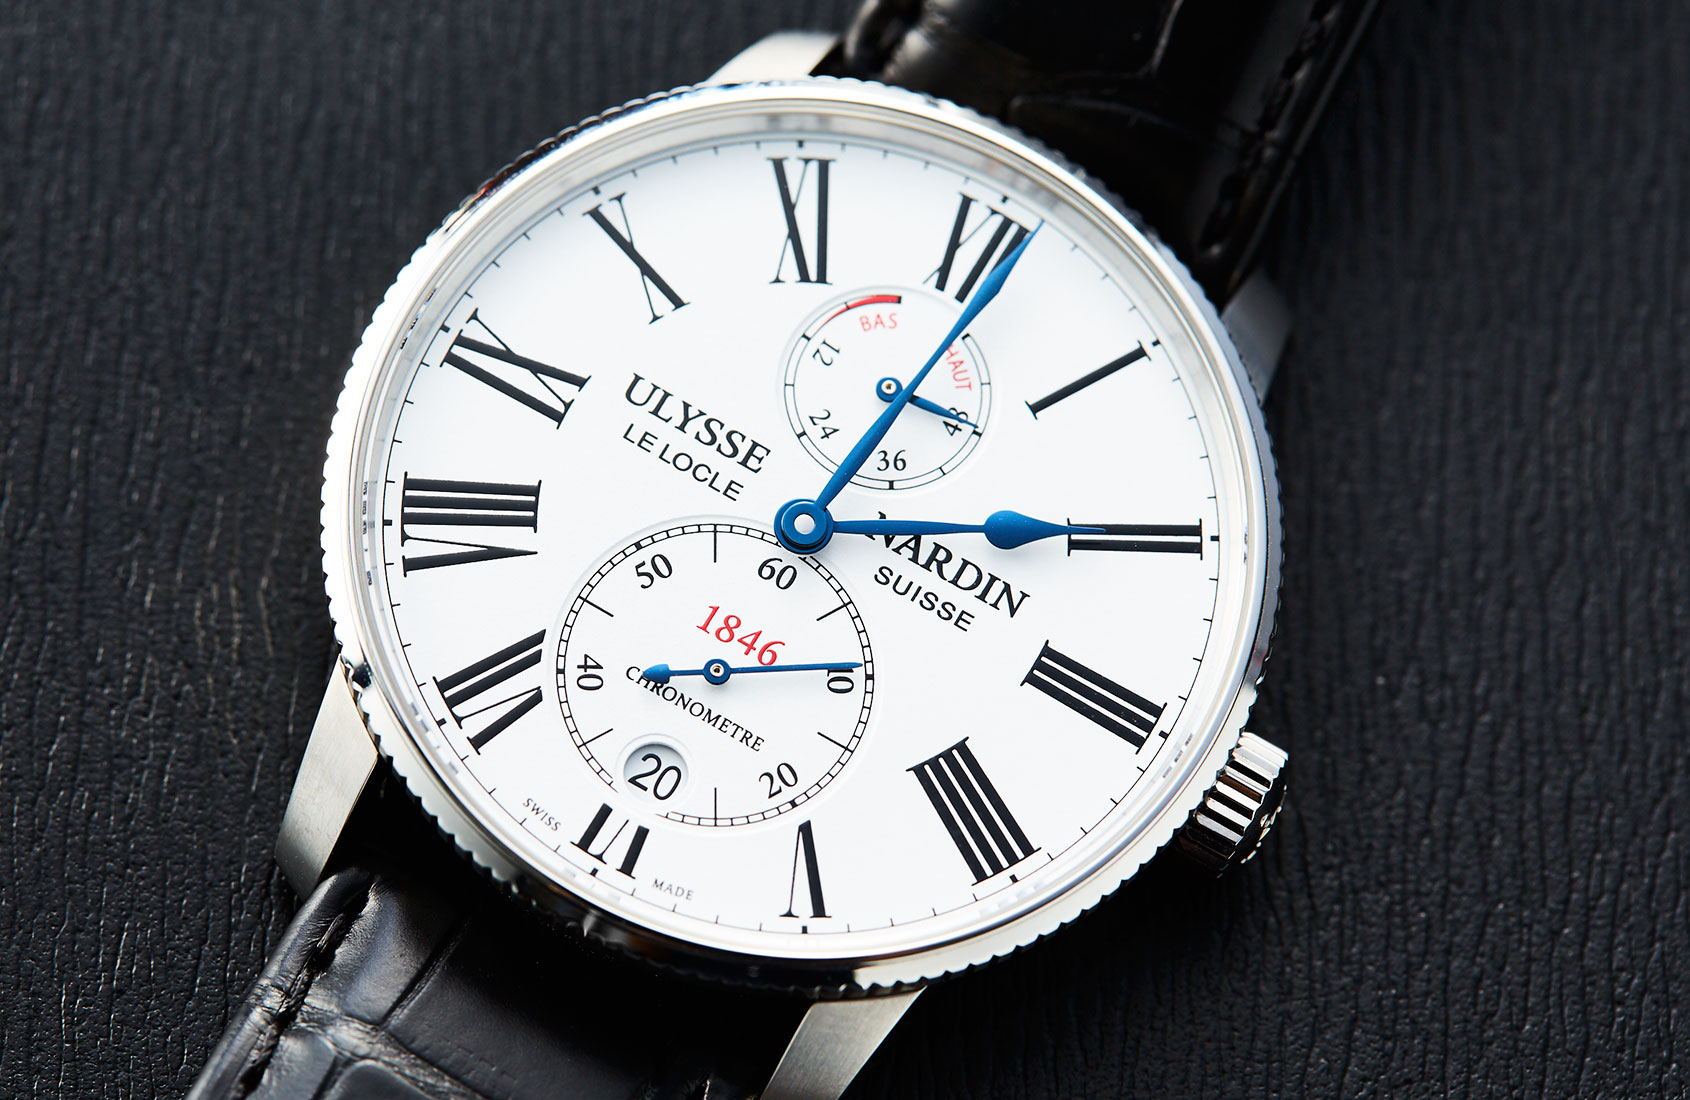 Set sail for glory with the Ulysse Nardin Marine Chronometer Torpilleur